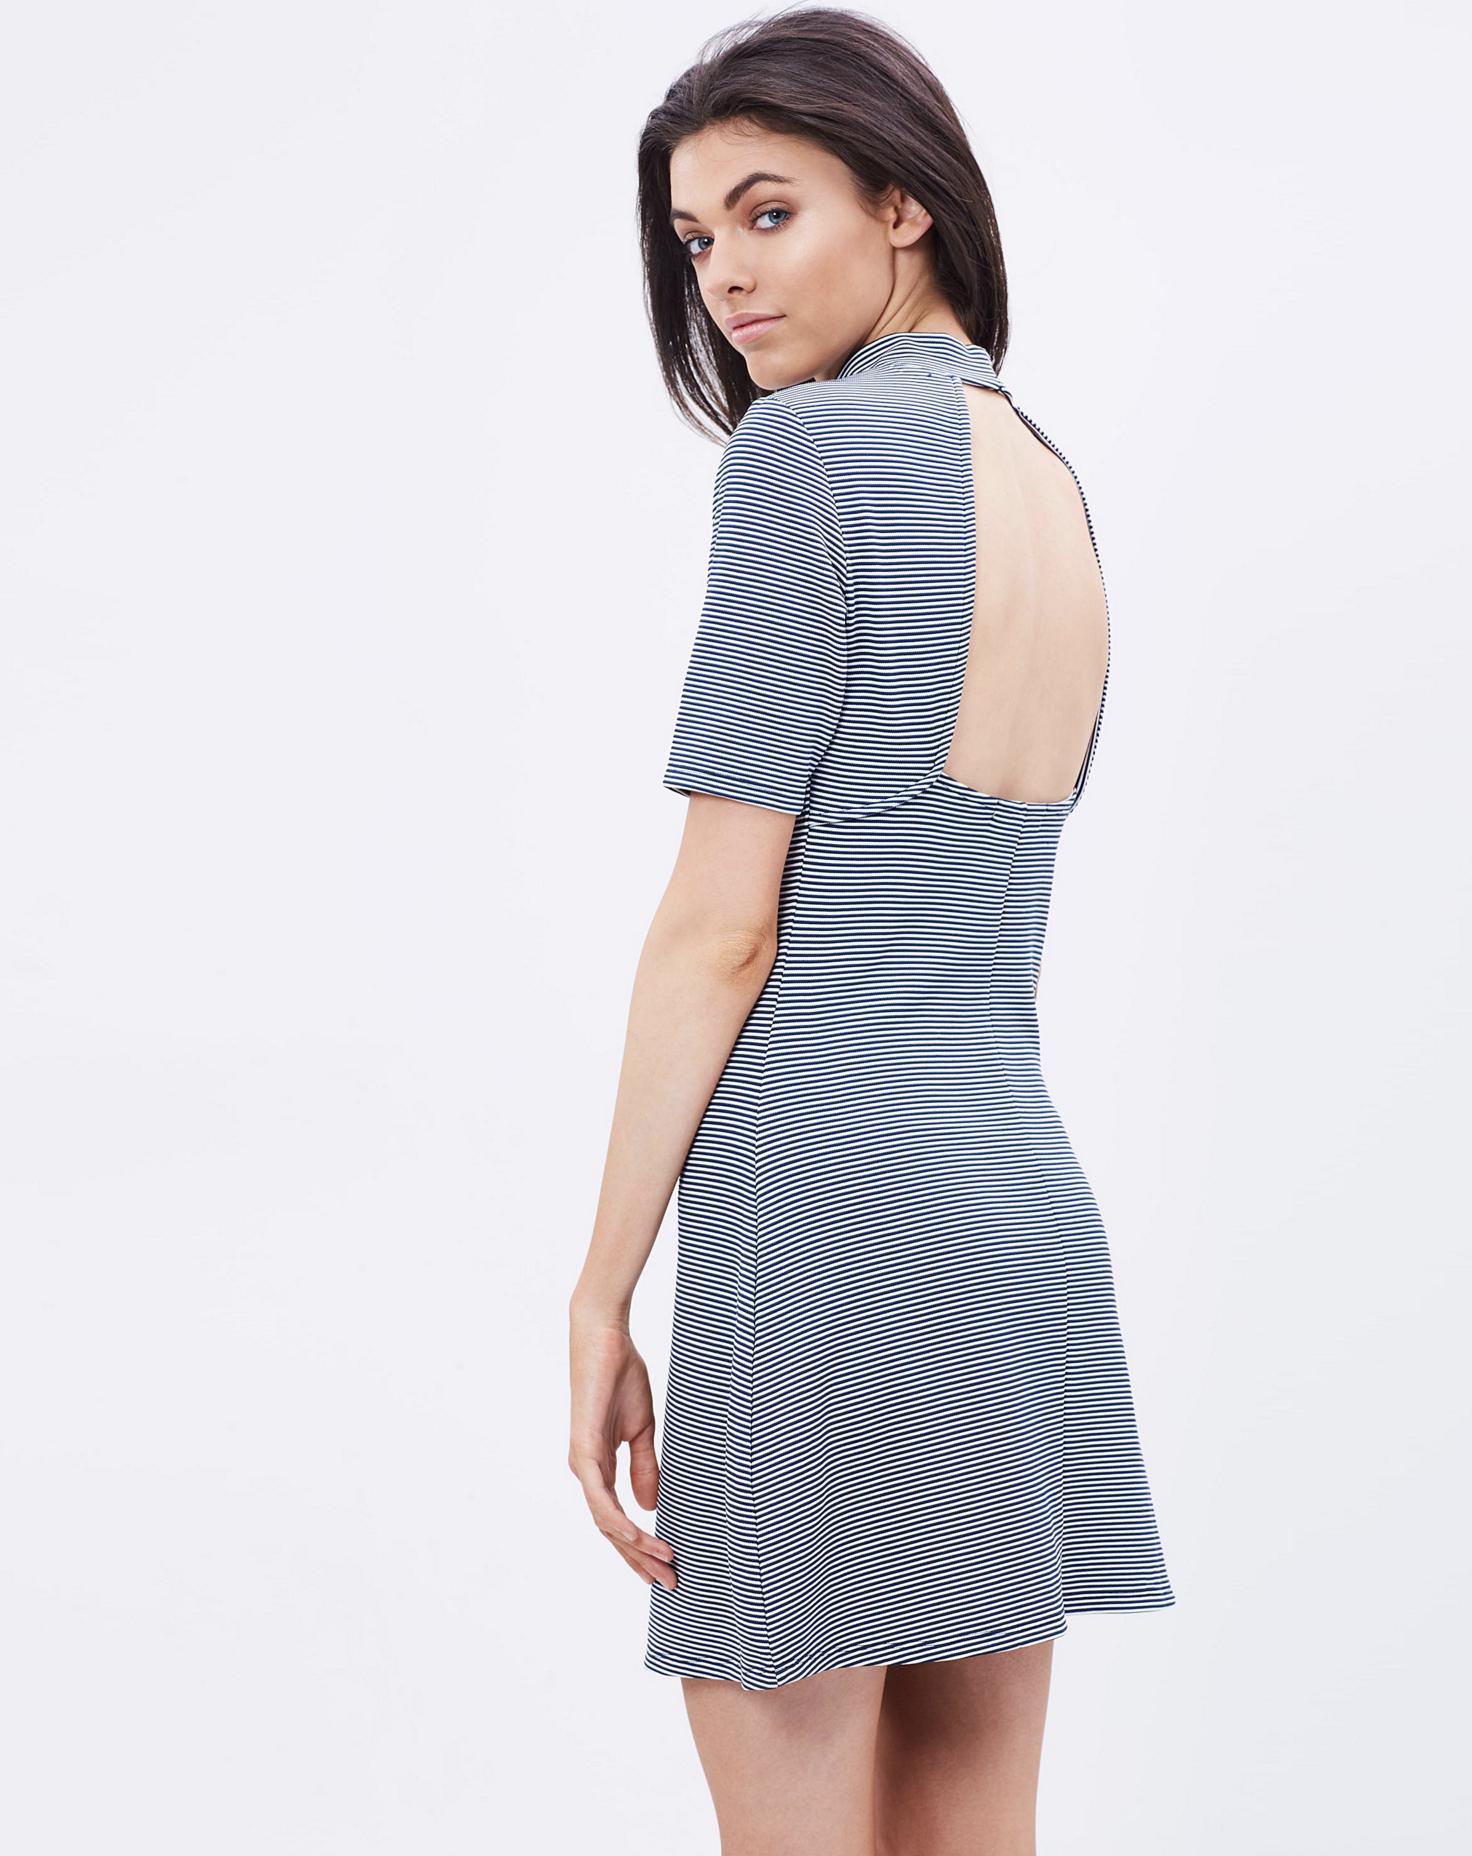 Nude Lucy odin open back dress $69.95